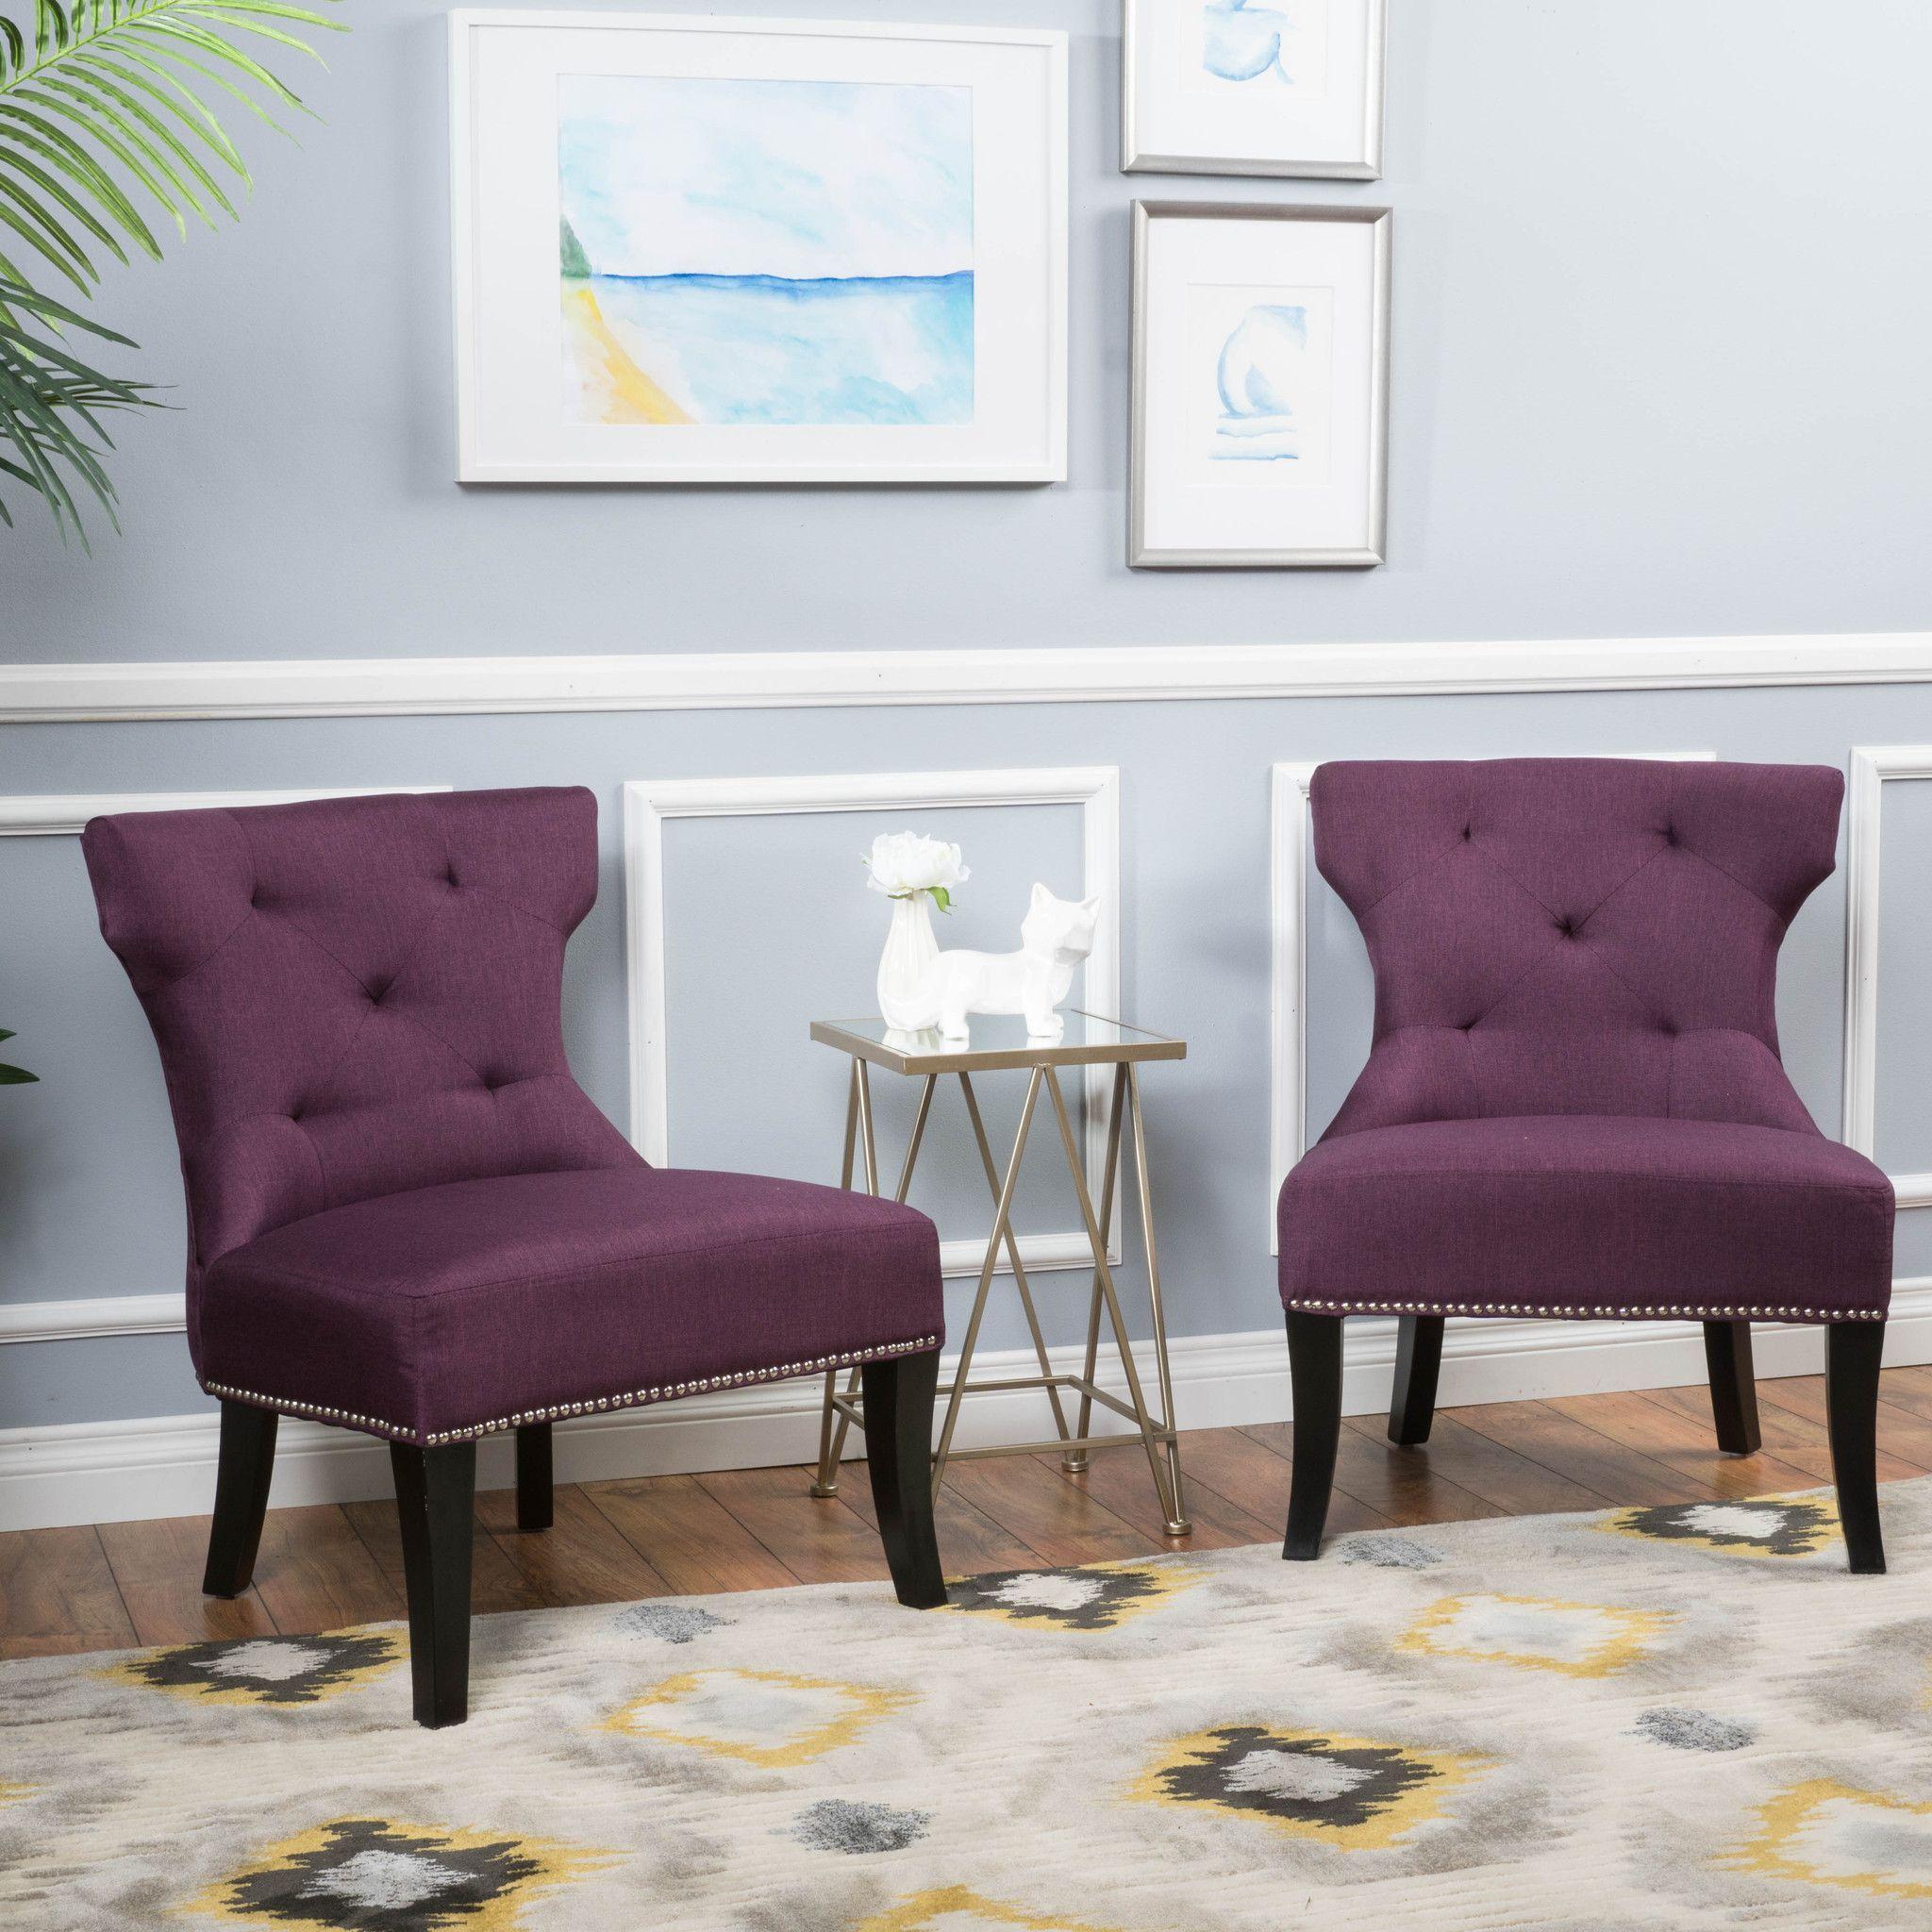 Genero Blue Fabric Chair w/ Nailhead Accents (Set of 2)   Fabric ...